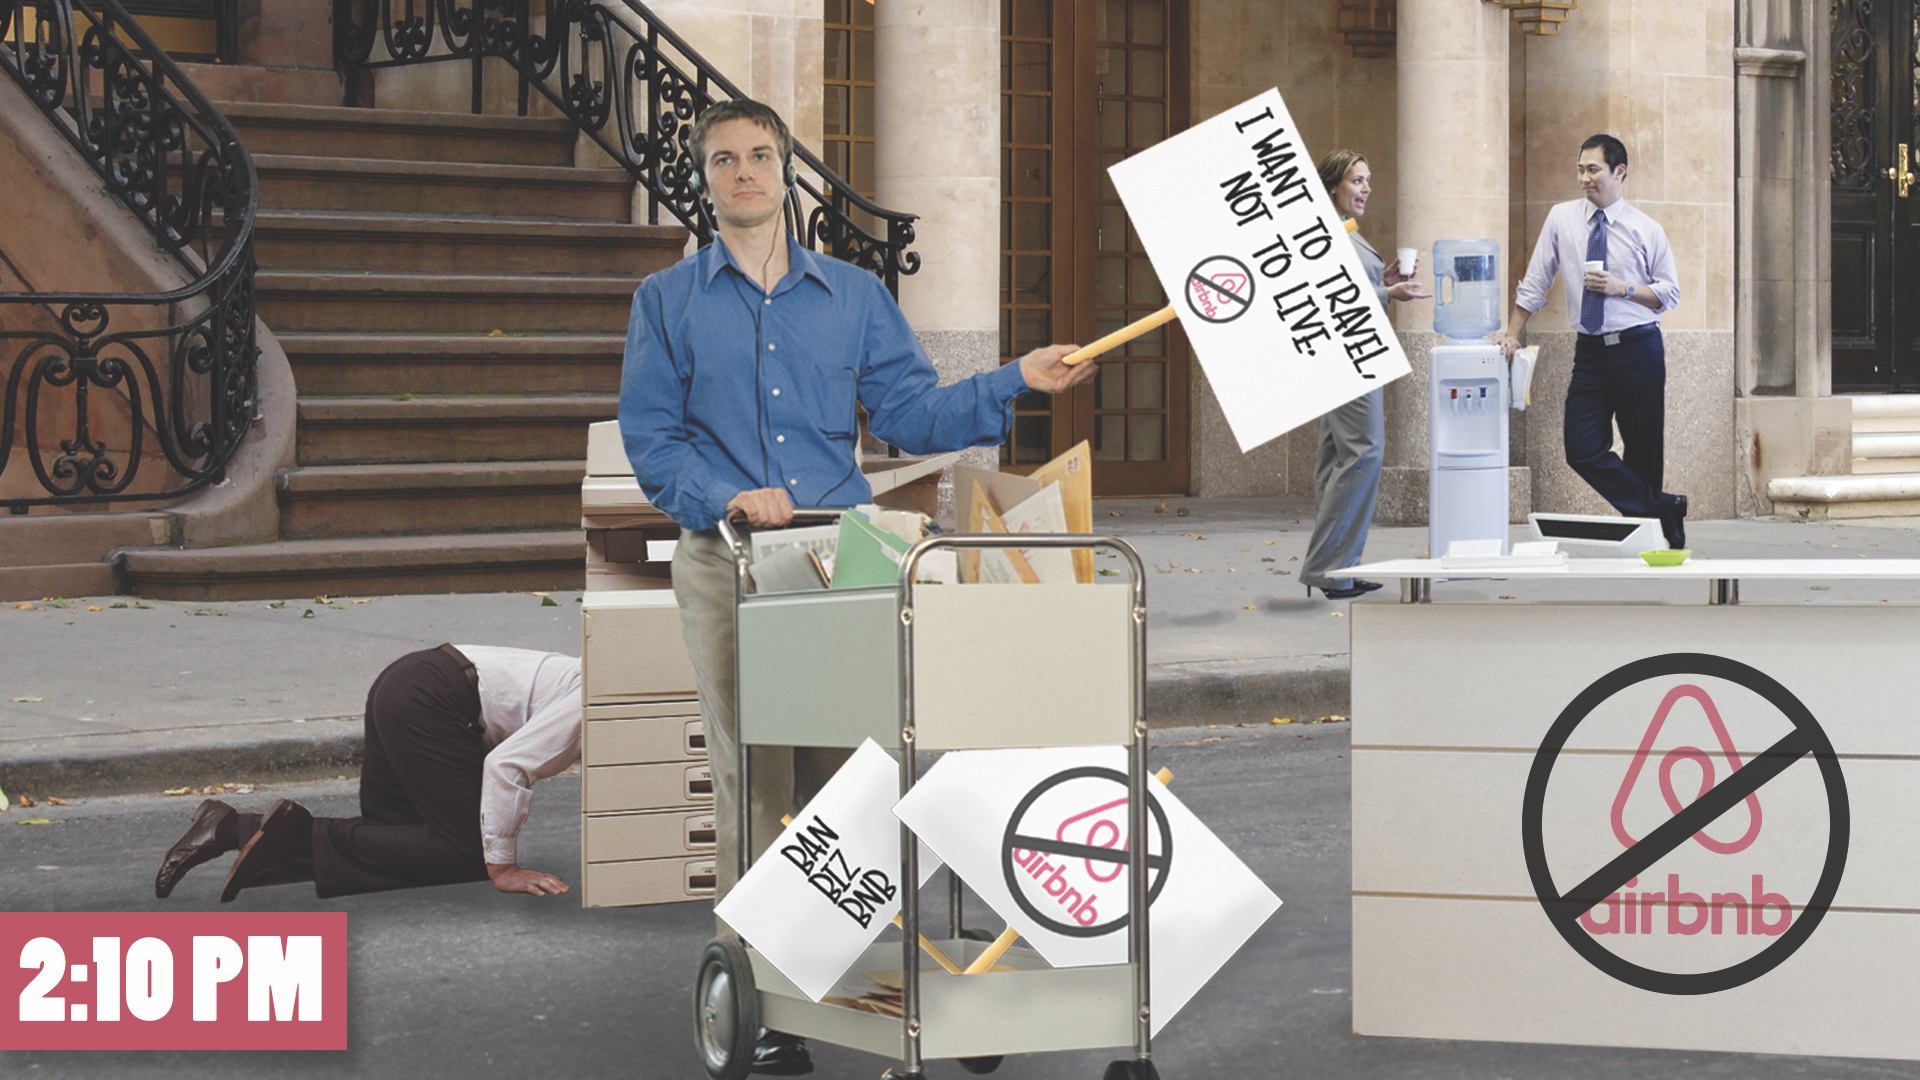 Distribute Protest Materials